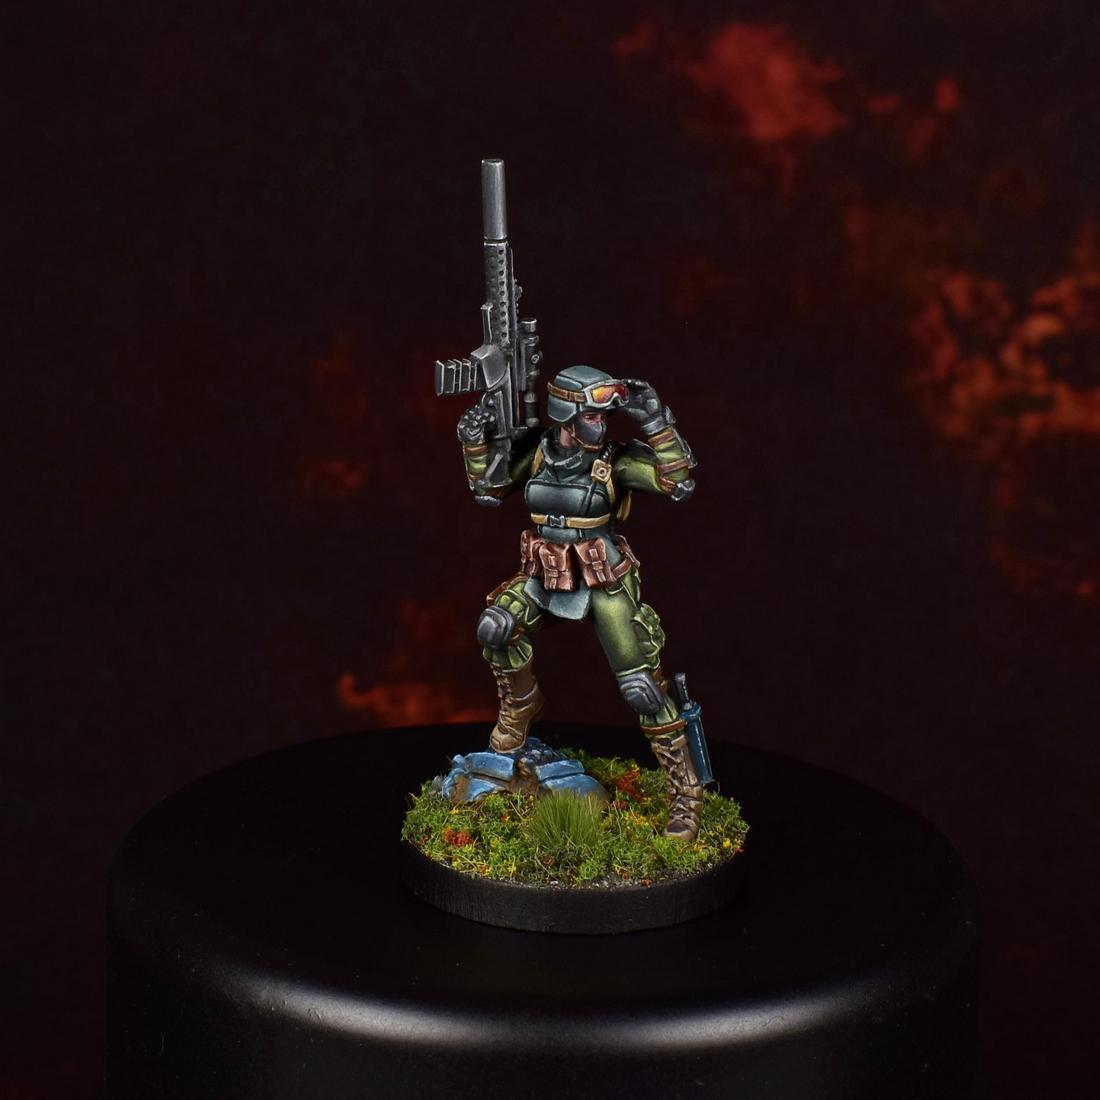 Ariadna, Tankhunter, Tartary Army Corps